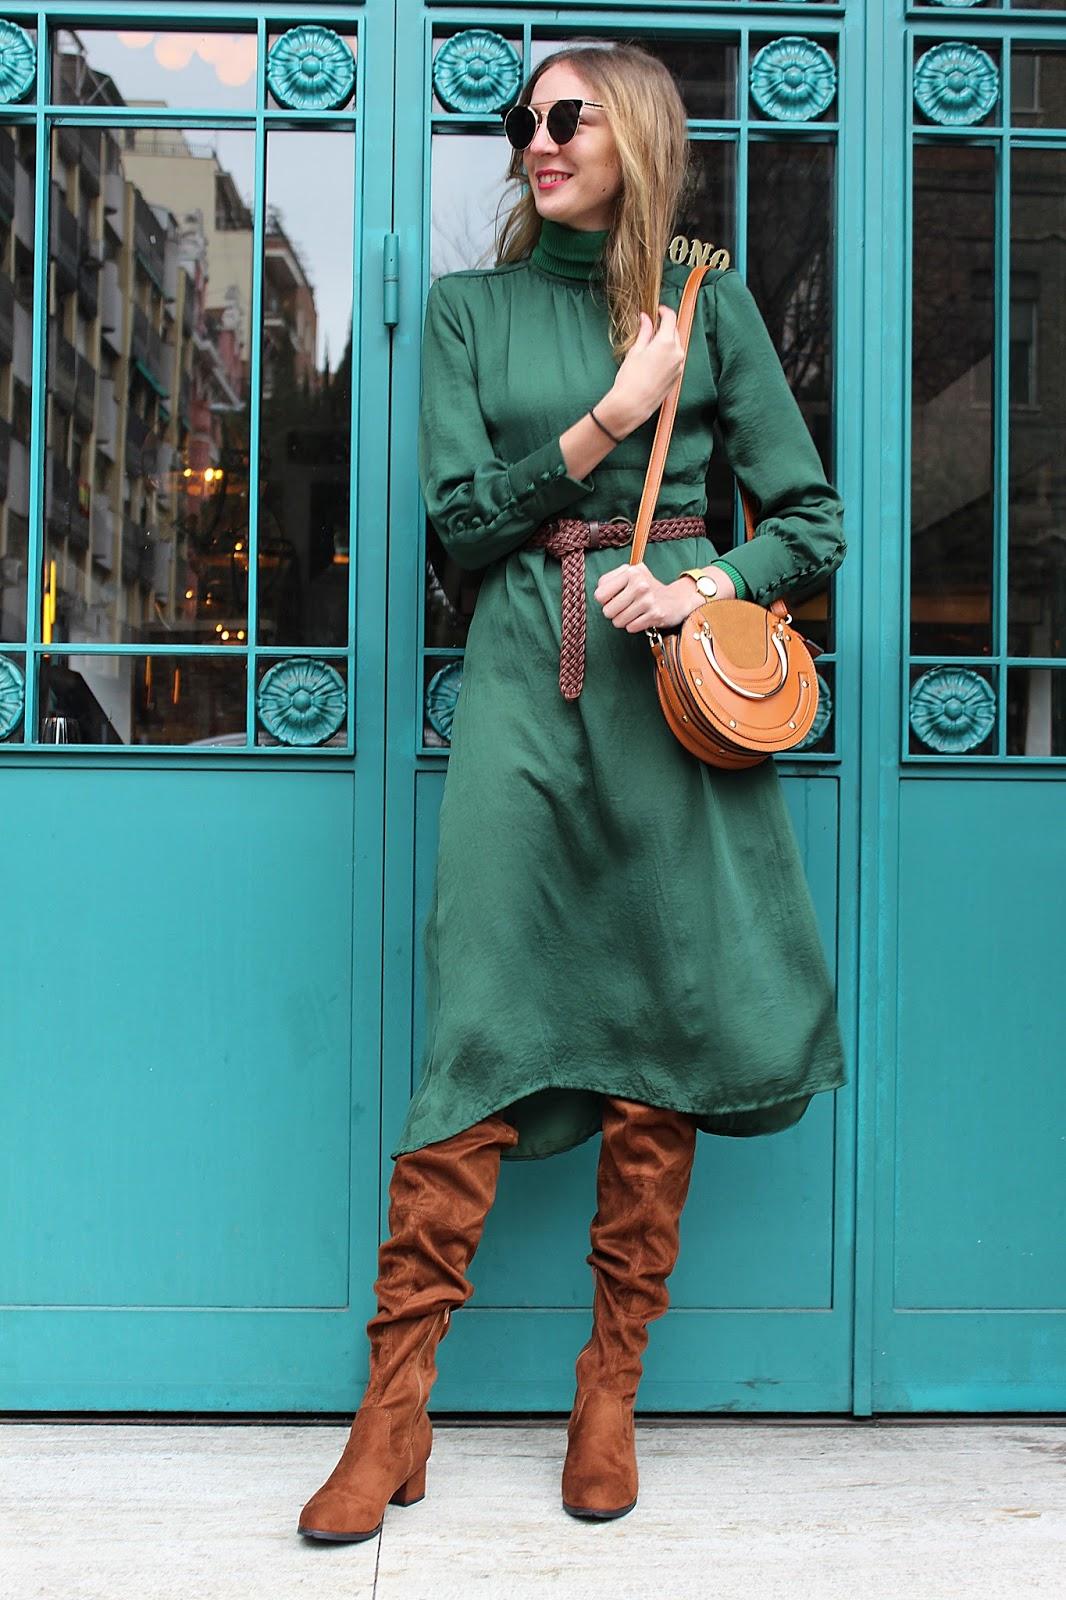 pixie-chloe-clon-midi-dress-shein-over-the-knee-boots